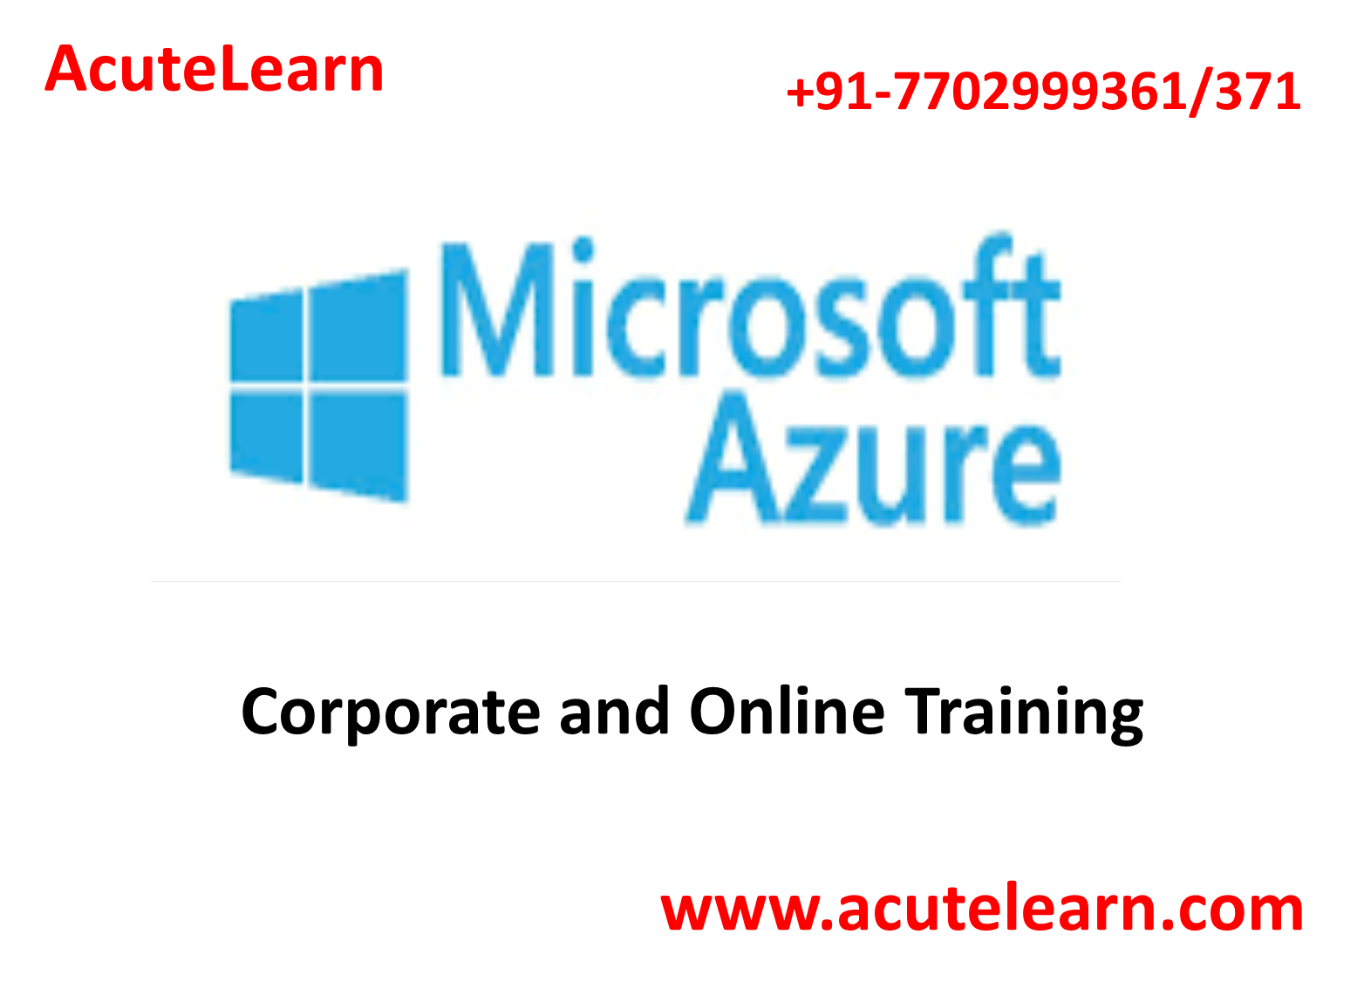 Best Microsoft Azure Training Institute in Hyderabad